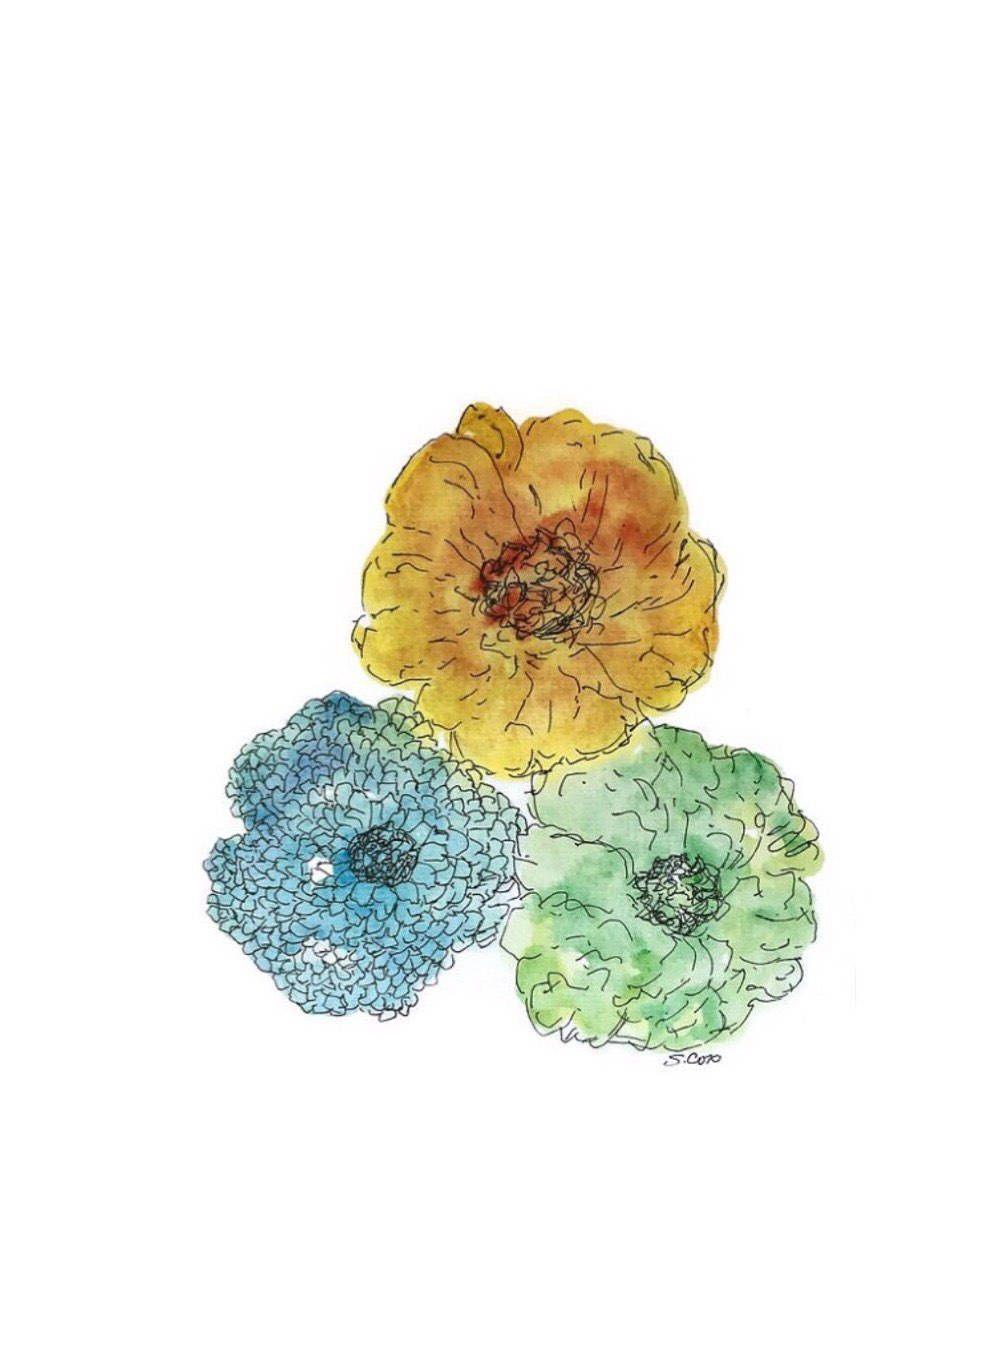 Pin On Watercolorartfinds Original Art